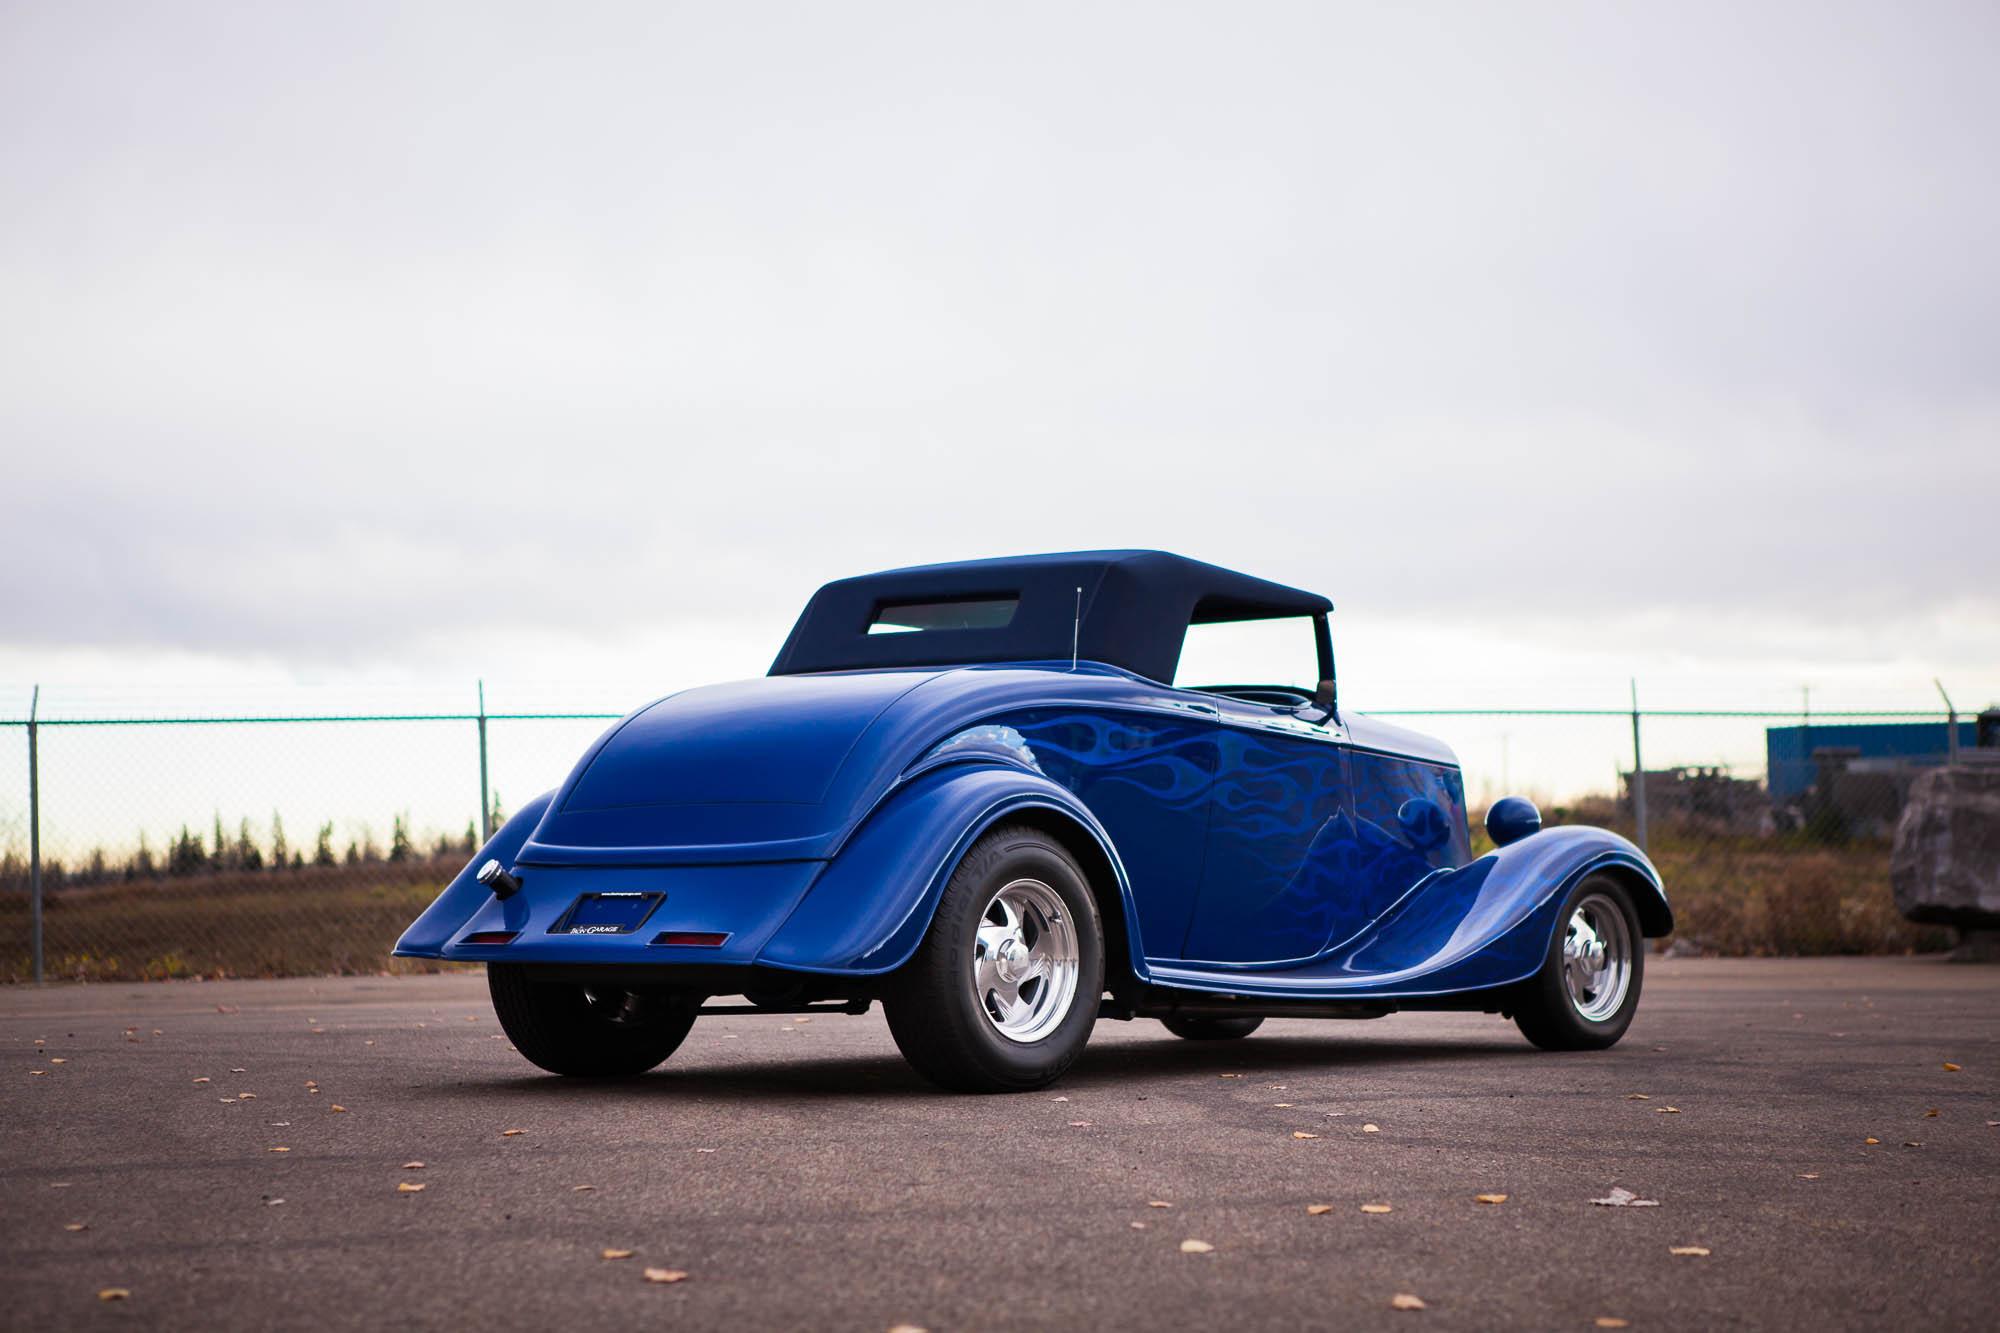 1933 Full-Fender Ford Roadster - For Sale - The Iron Garage